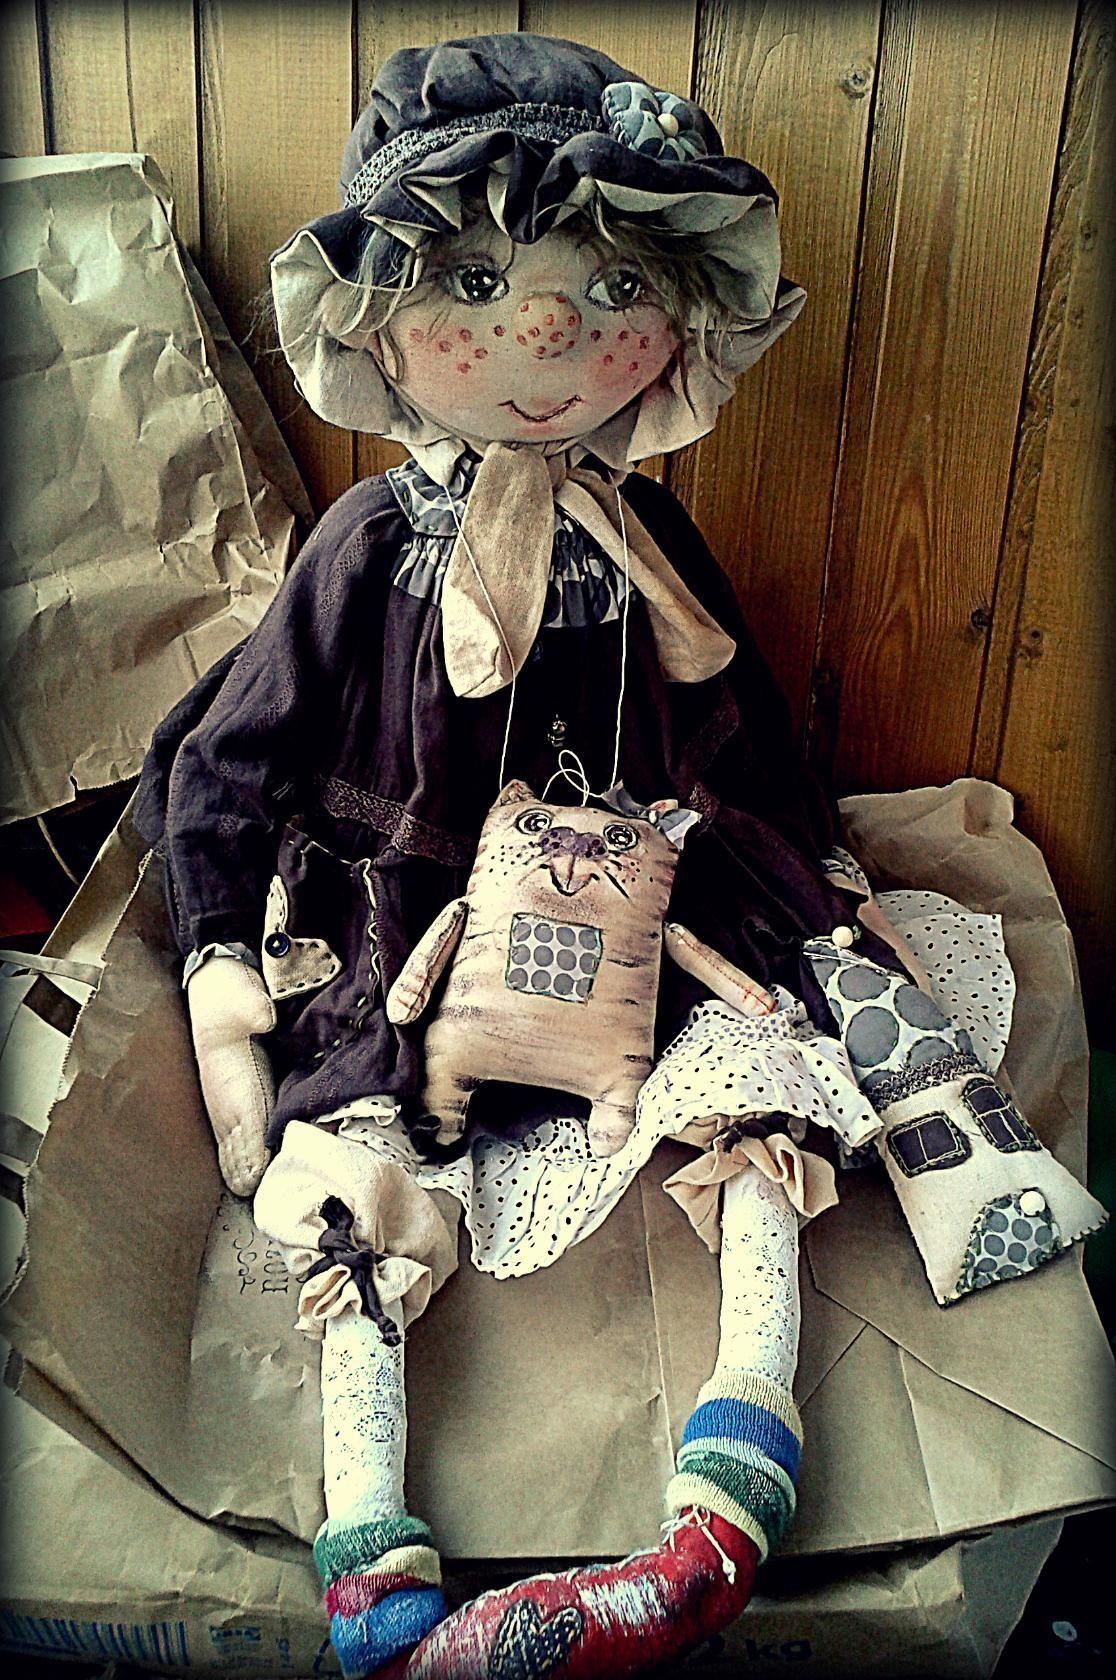 даже том, картинки куклы шабашники нём говорится